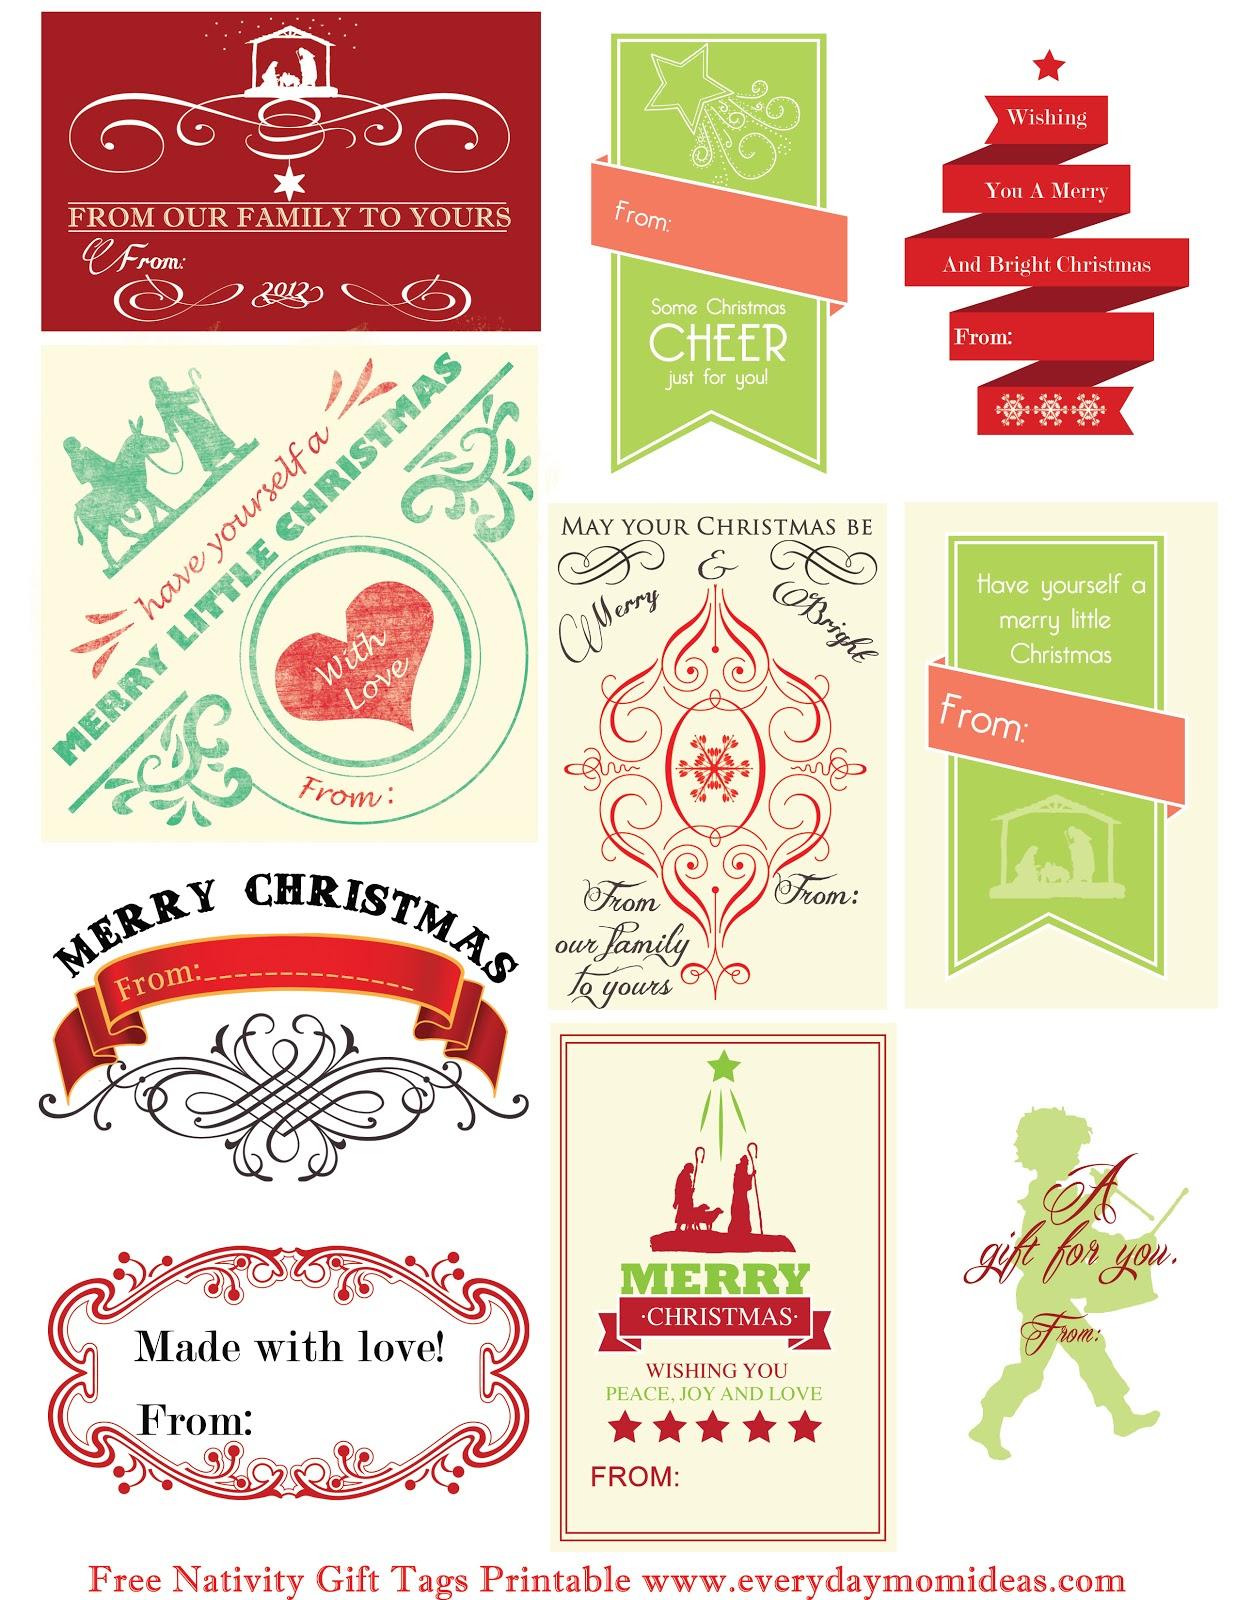 Free Nativity Gift Tags Printable - Everyday Mom Ideas - Free Printable Gift Tags Personalized